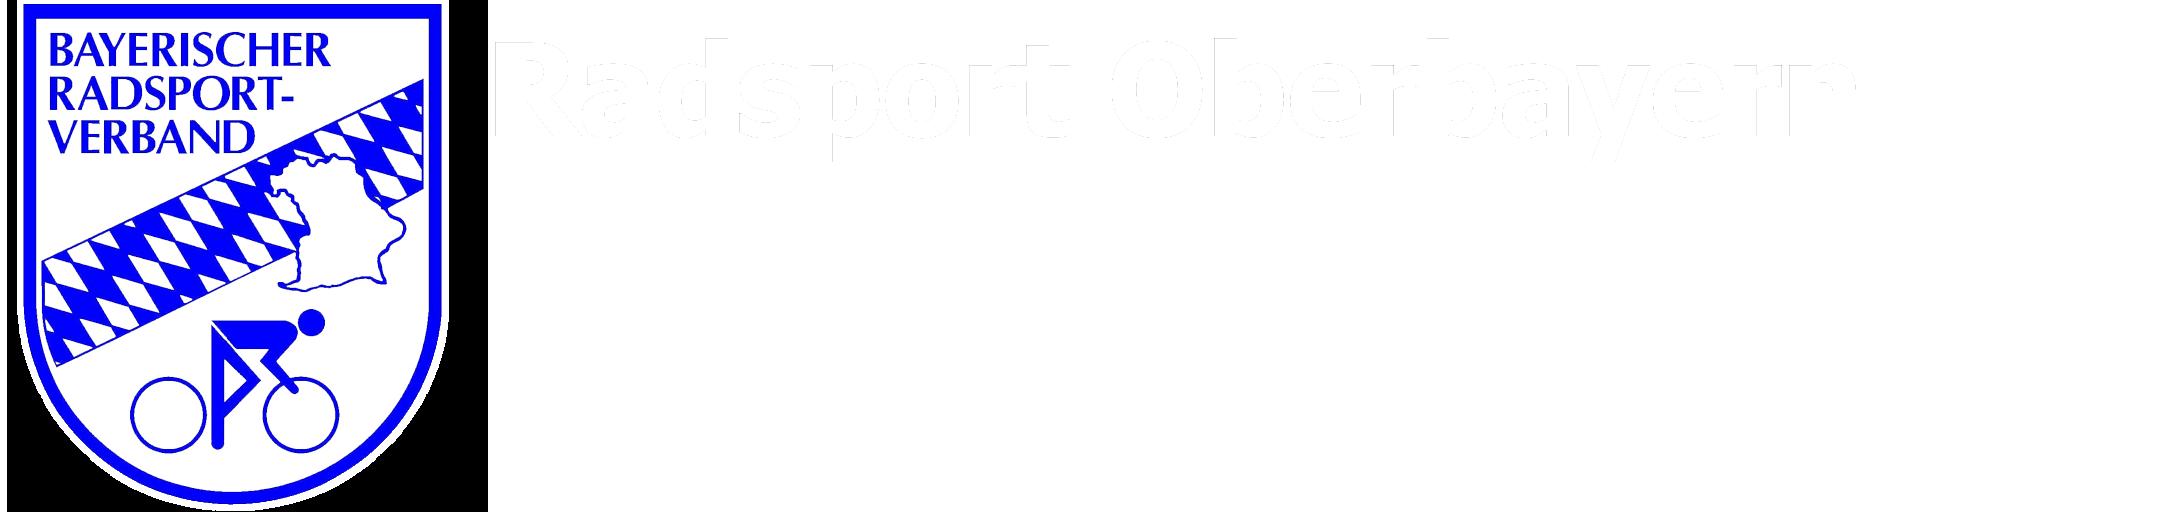 Radsport Oberbayern